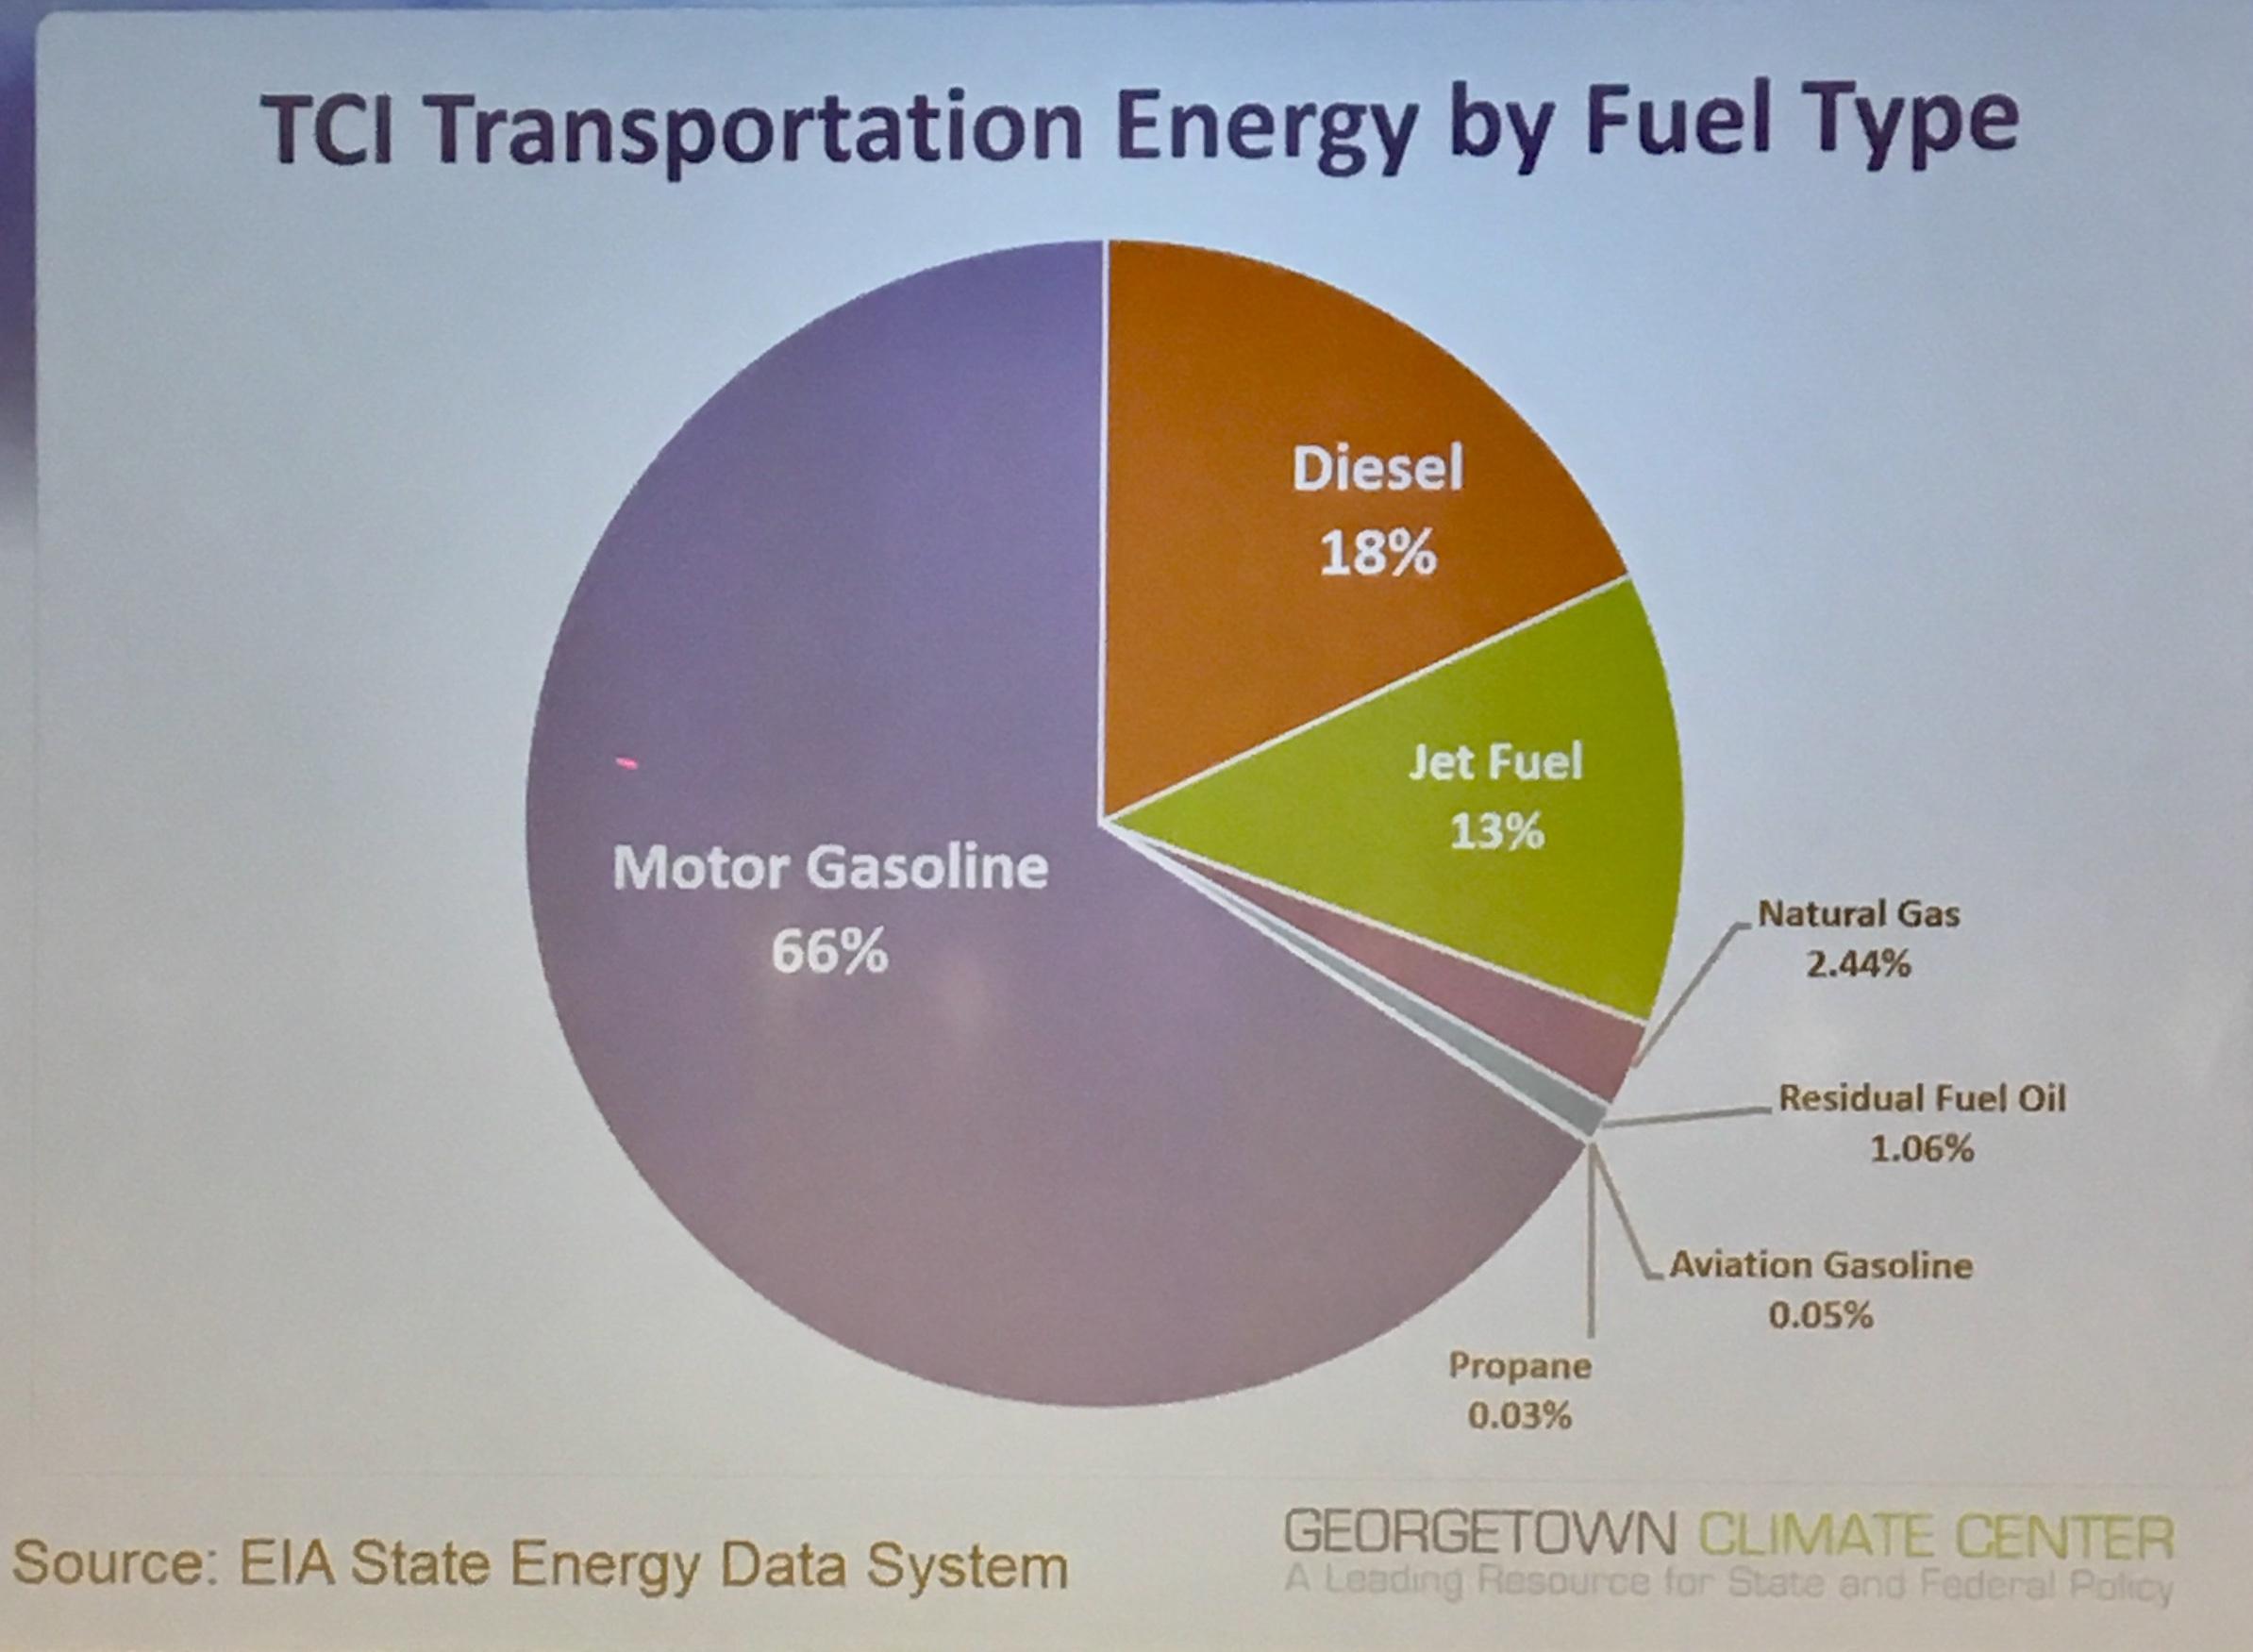 TCI_by_Fuel_Type.jpg